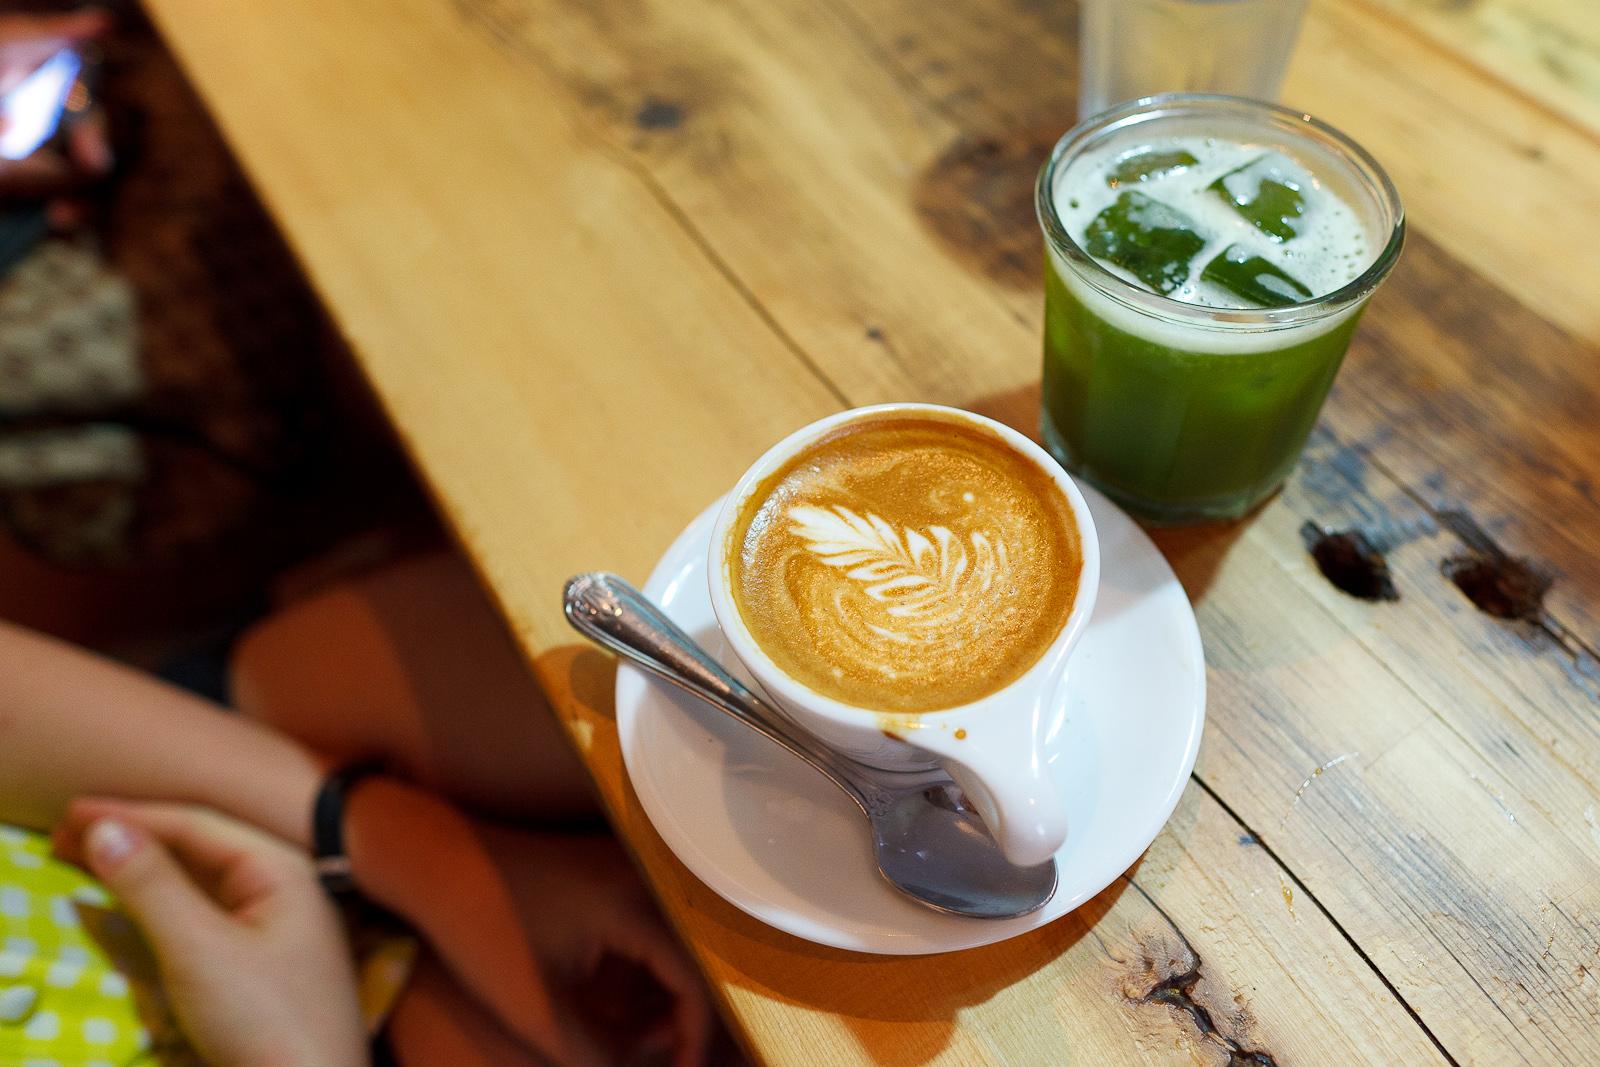 Cappuccino ($3.50) and Iced Matcha Green Tea ($3.50)